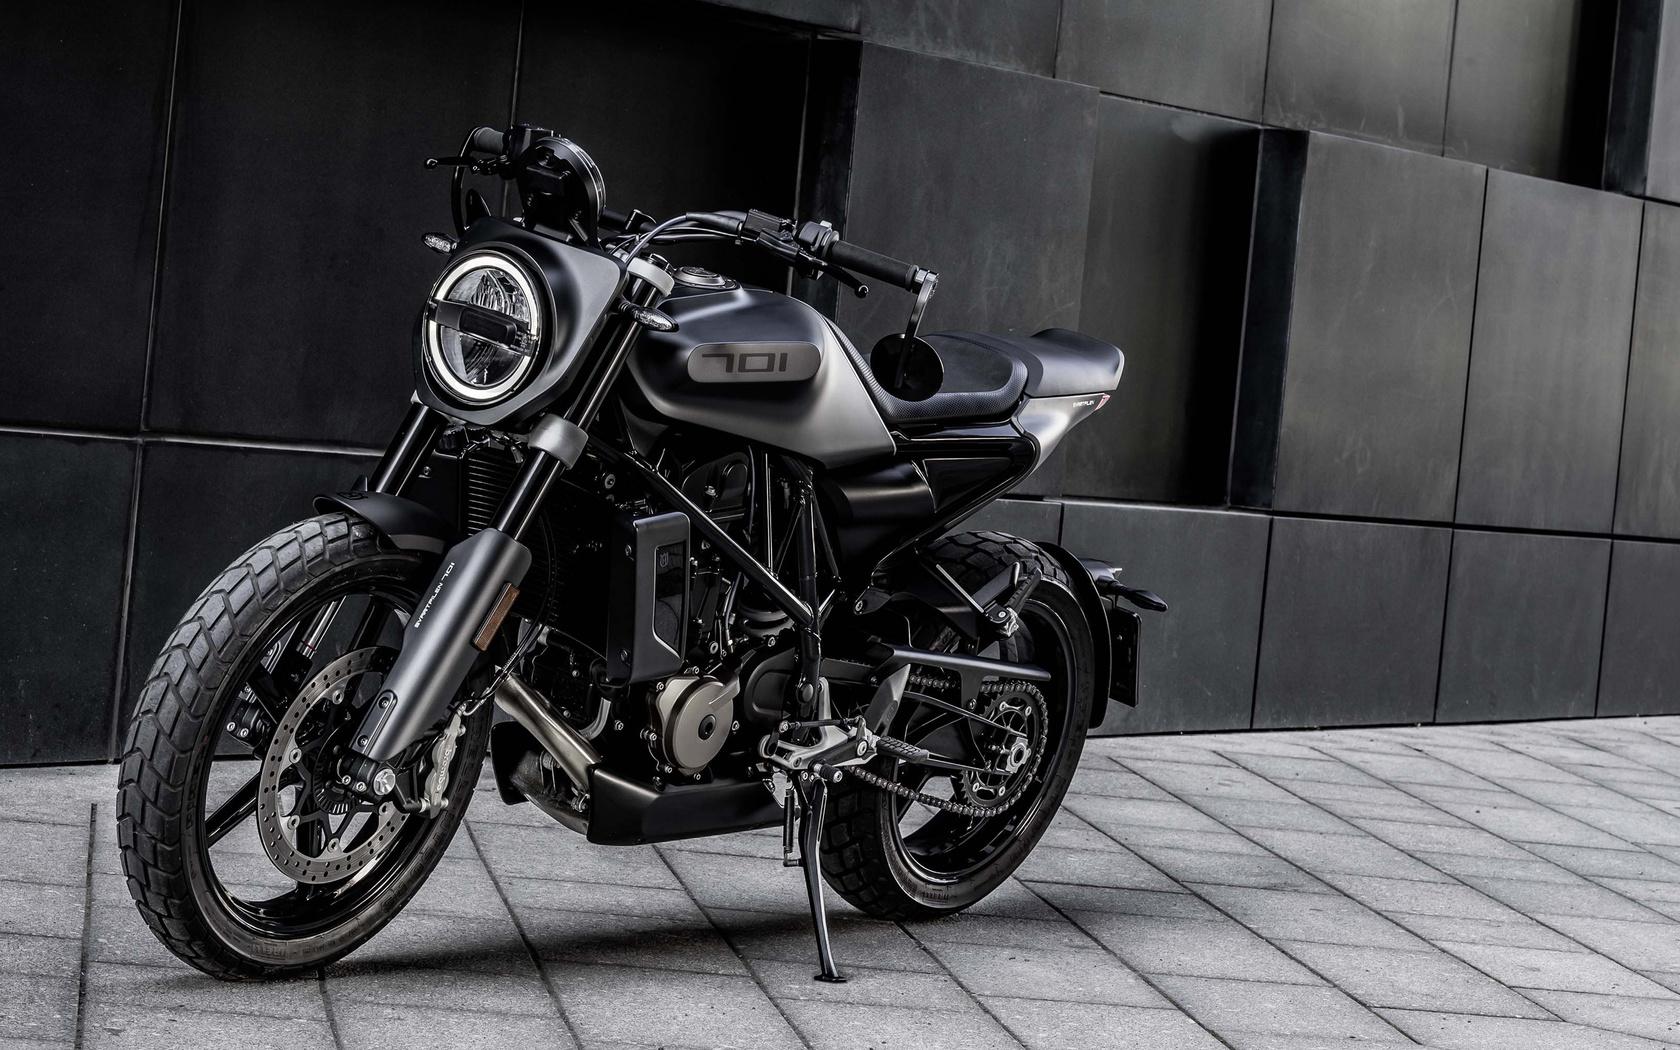 husqvarna, svartpilen, 701, мотоцикл